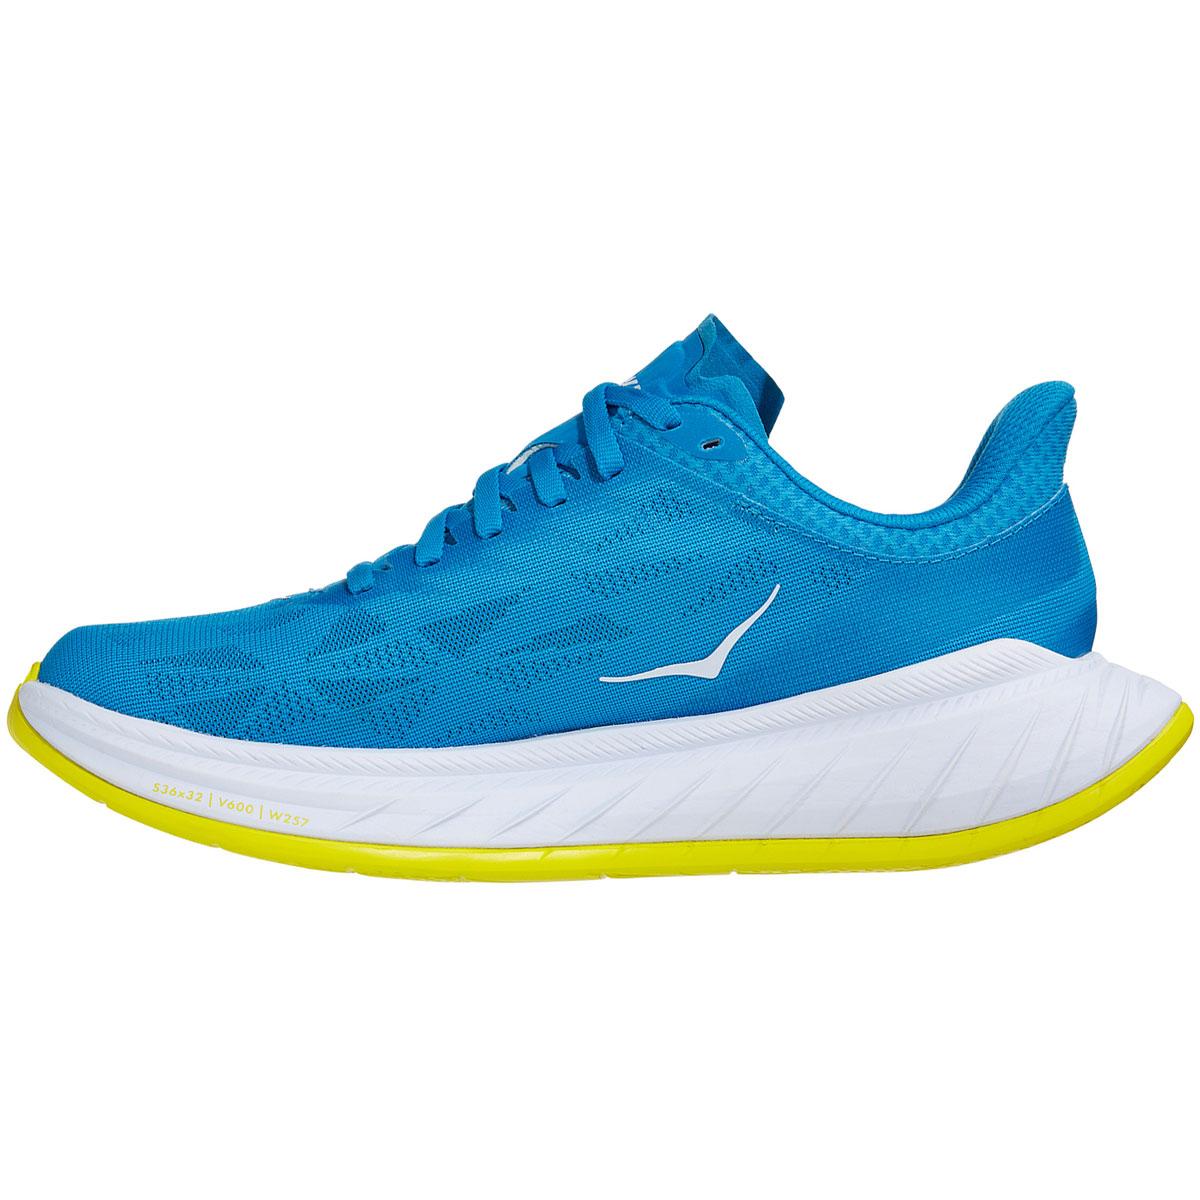 Women's Hoka One One Carbon X 2 Running Shoe - Color: Diva Blue/Citron - Size: 5 - Width: Regular, Diva Blue/Citron, large, image 2